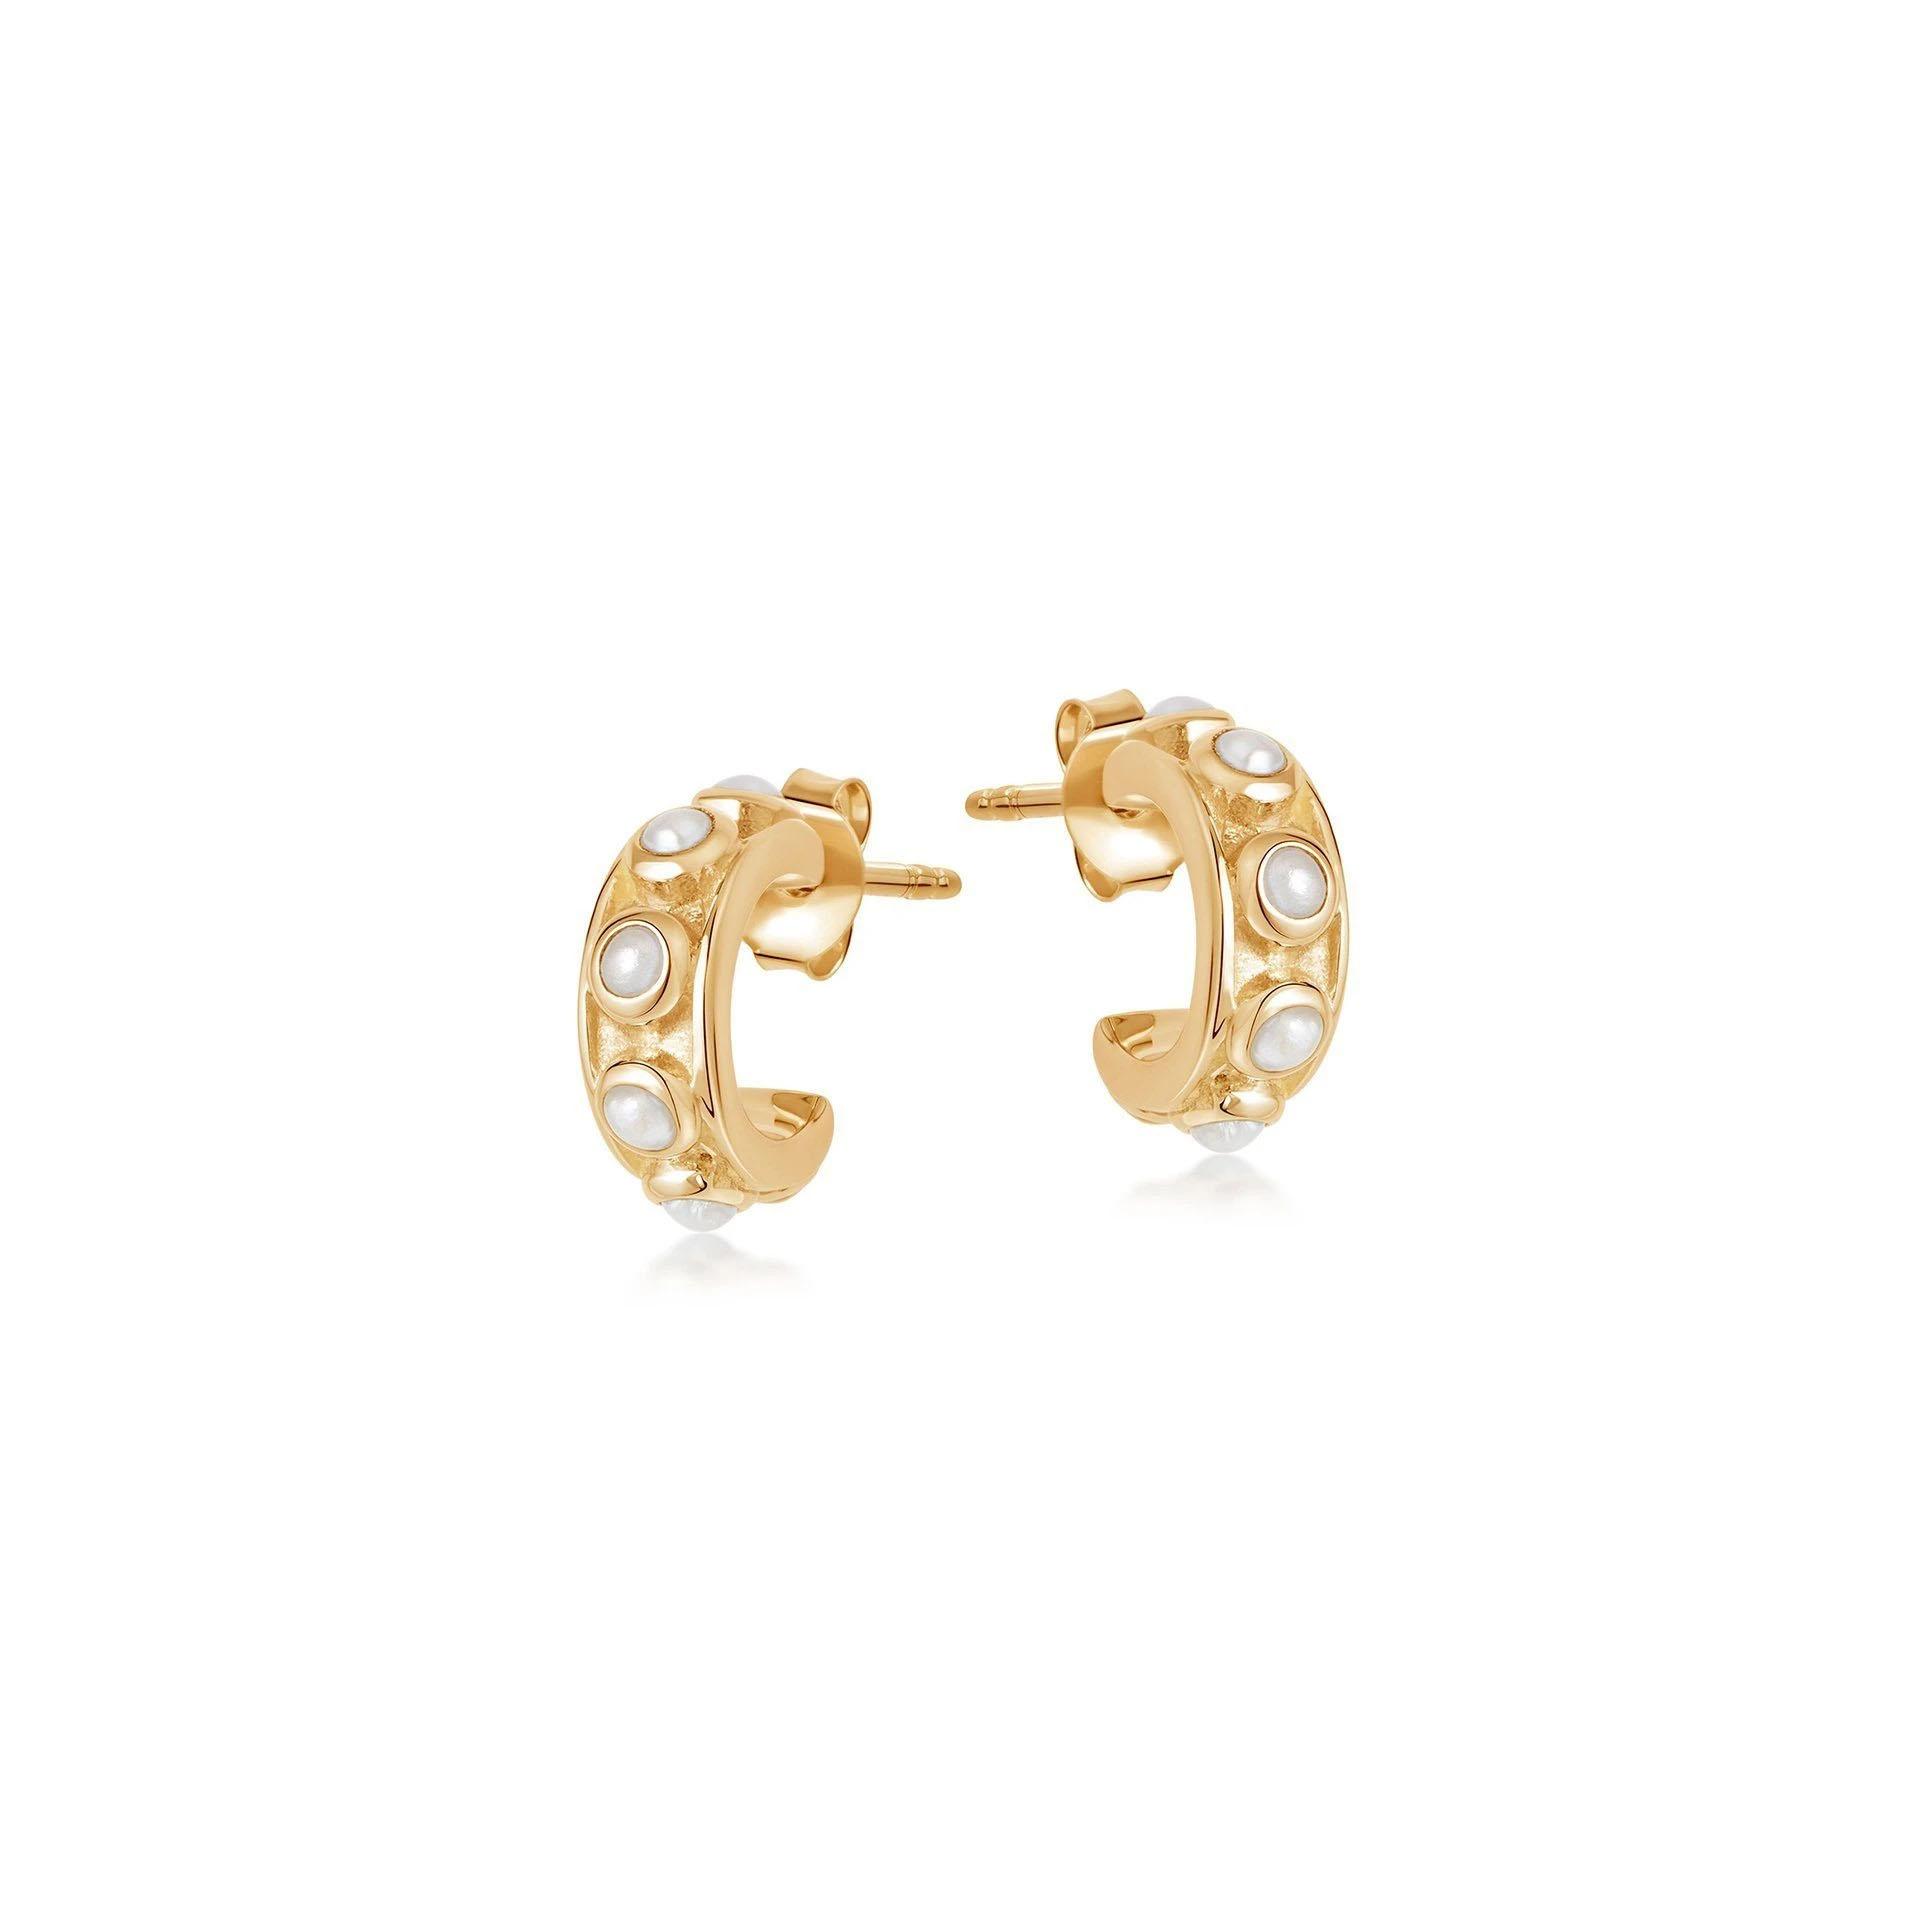 Wholesale OEM/ODM Jewelry OEM natural white pearls earrings set in 18ct gold vermeil on sterling silver